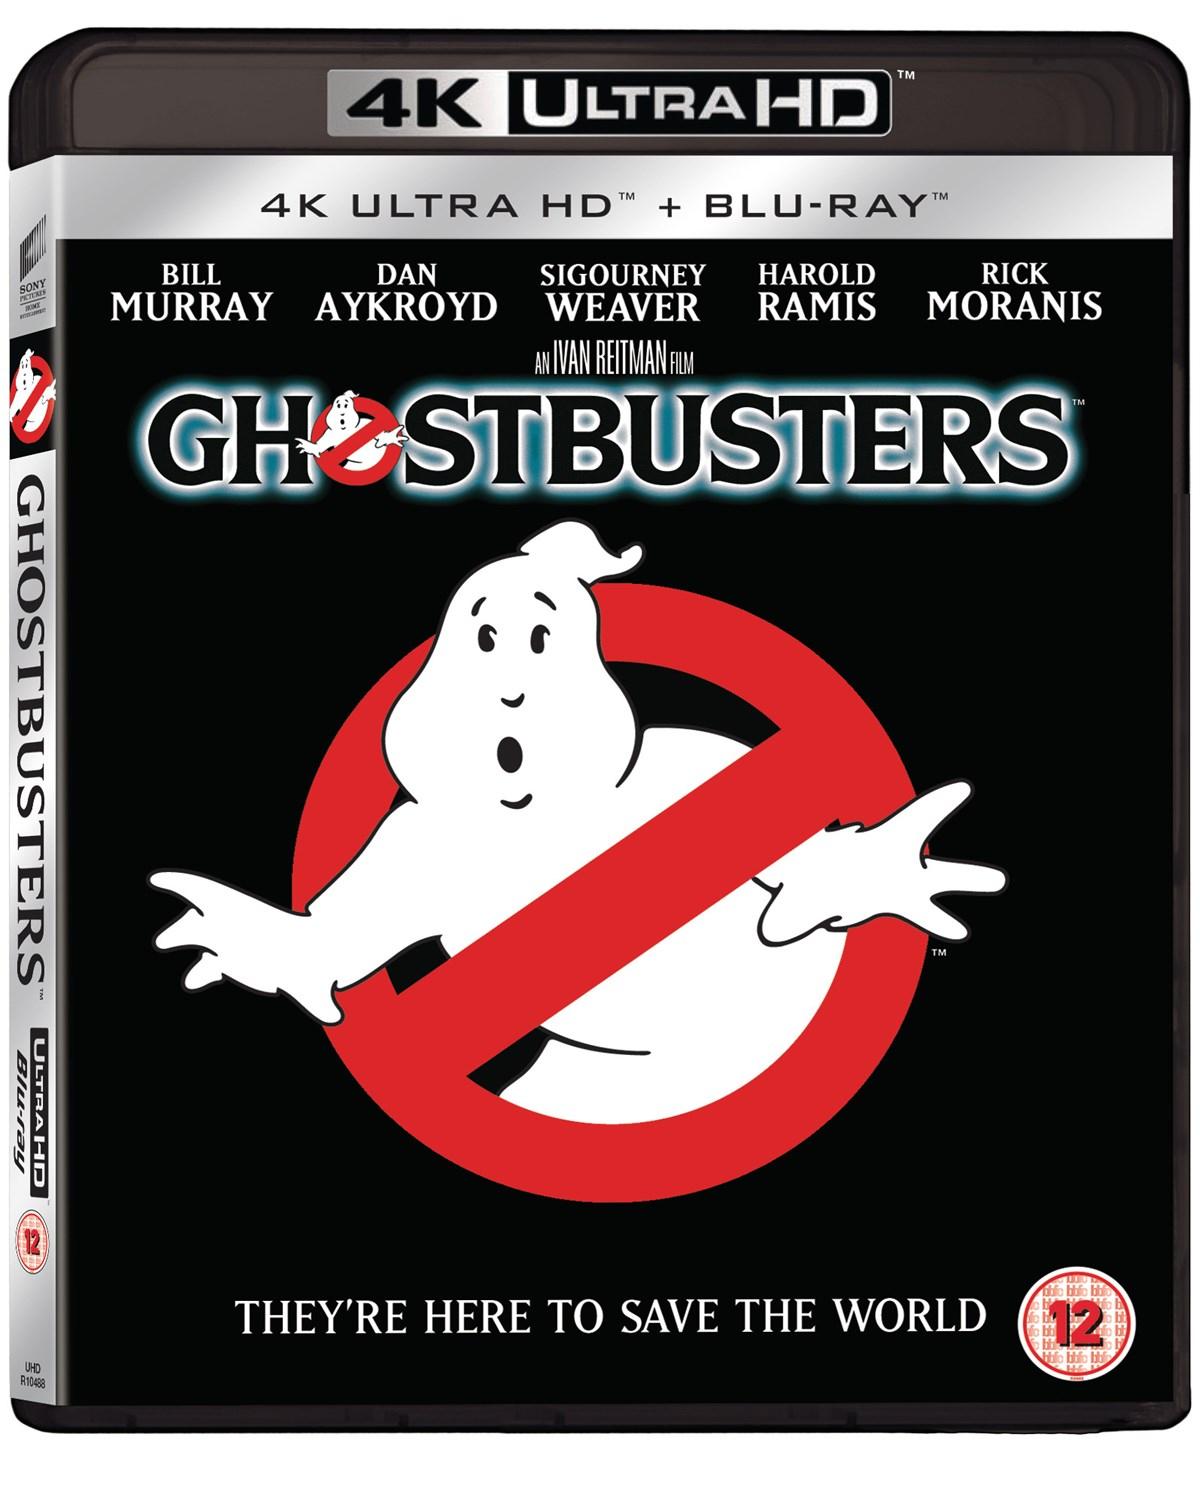 Ghostbusters (4K Ultra HD + Blu-ray) für 13,31€ inkl. Versand (Zoom UK)